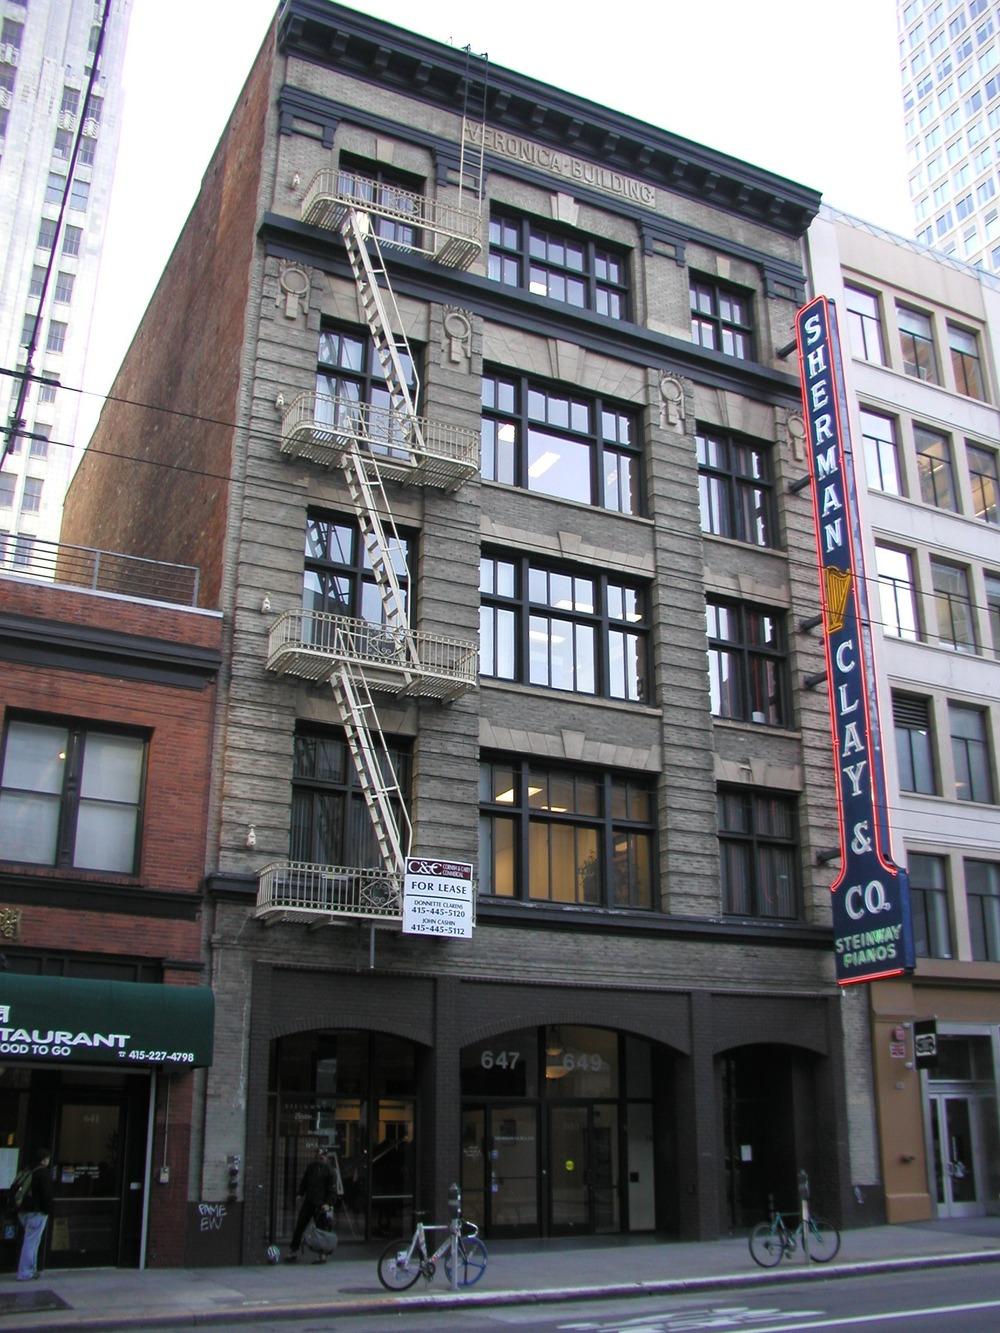 Readisuite - 649 Mission Street, San Francisco - CA